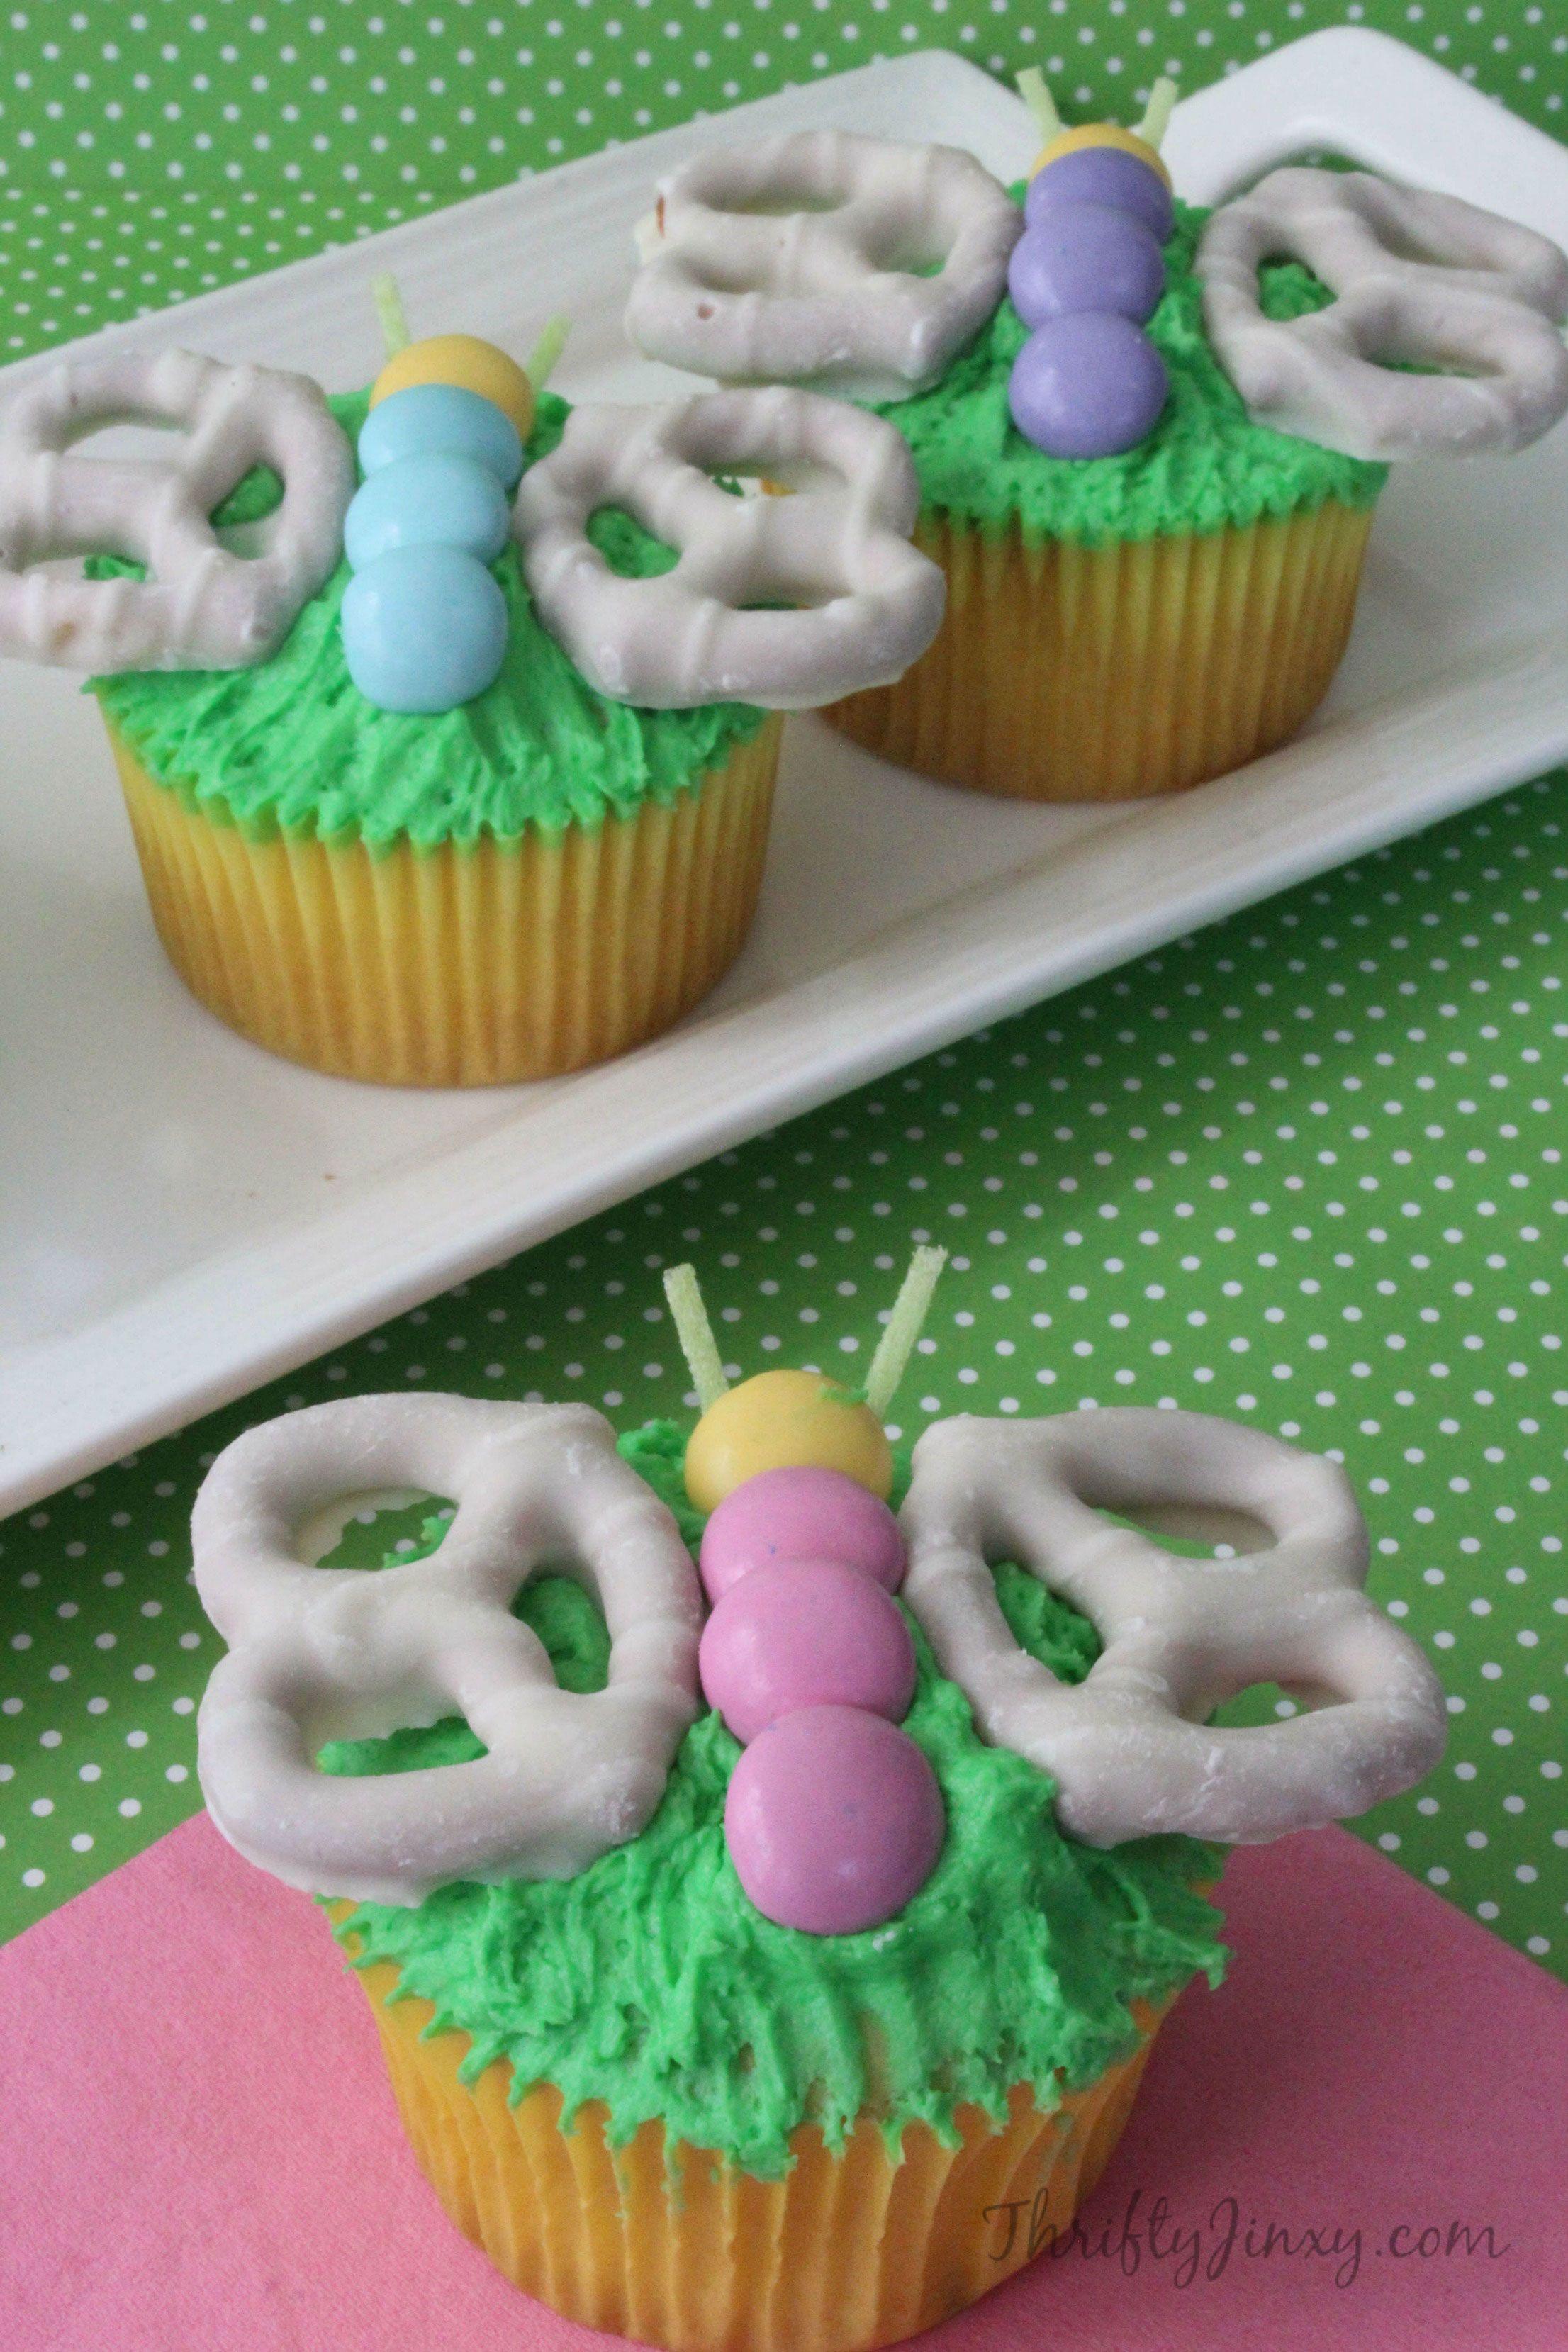 20+ Easy Spring Cupcake Ideas - Decorating Cute Spring Cupcakes u0026 Recipes & 20+ Easy Spring Cupcake Ideas - Decorating Cute Spring Cupcakes ...